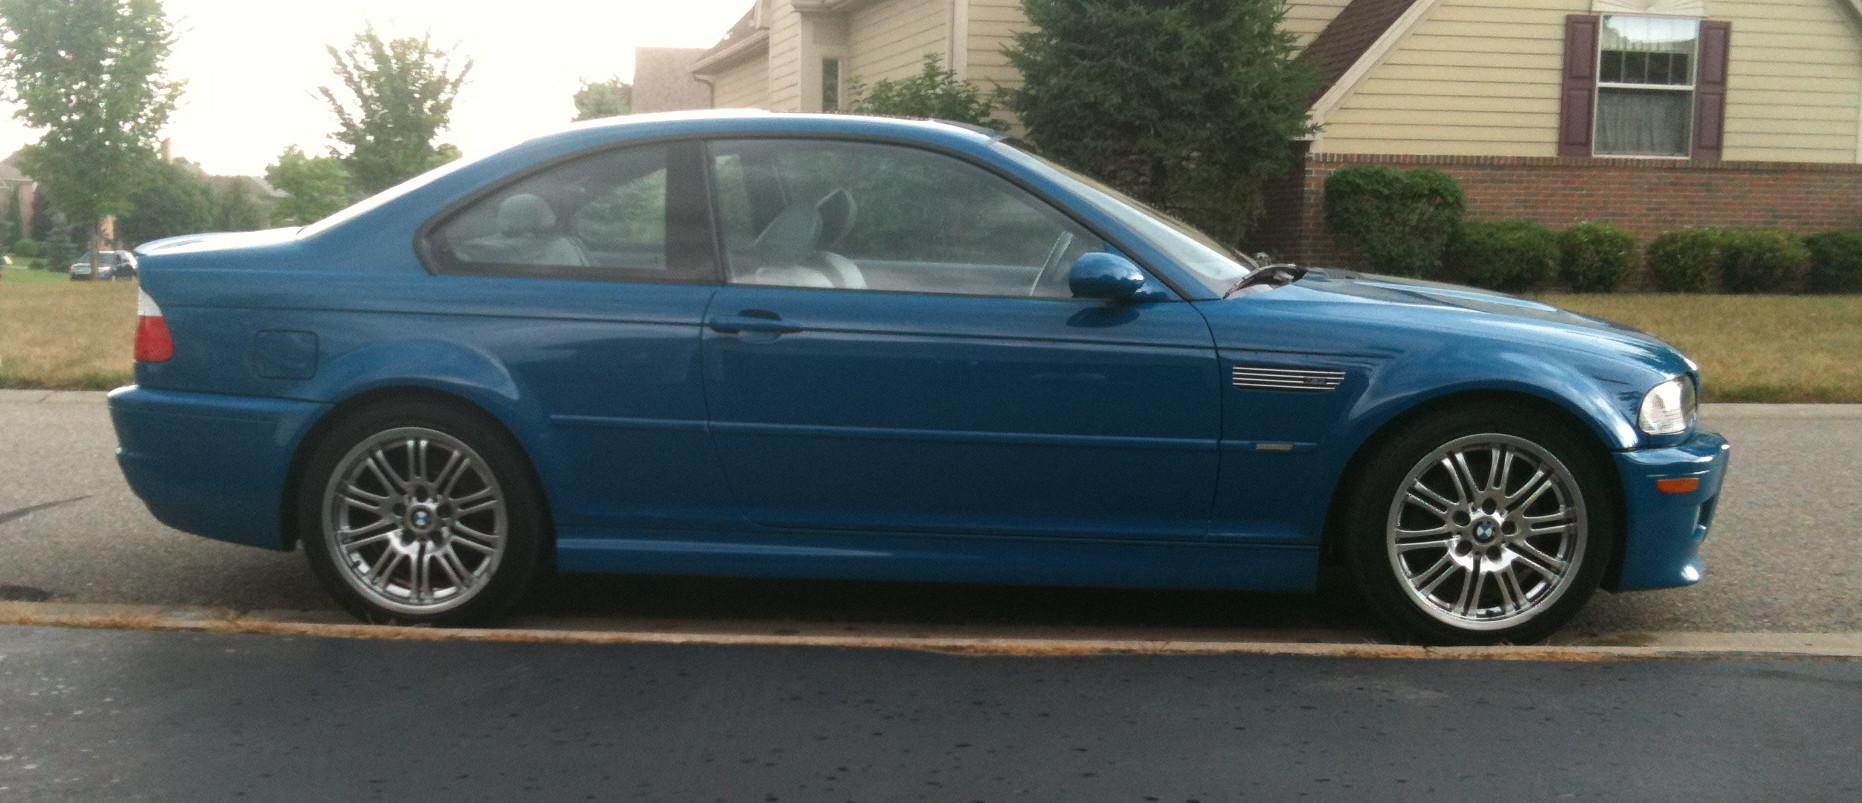 Robin's 2001 BMW M3